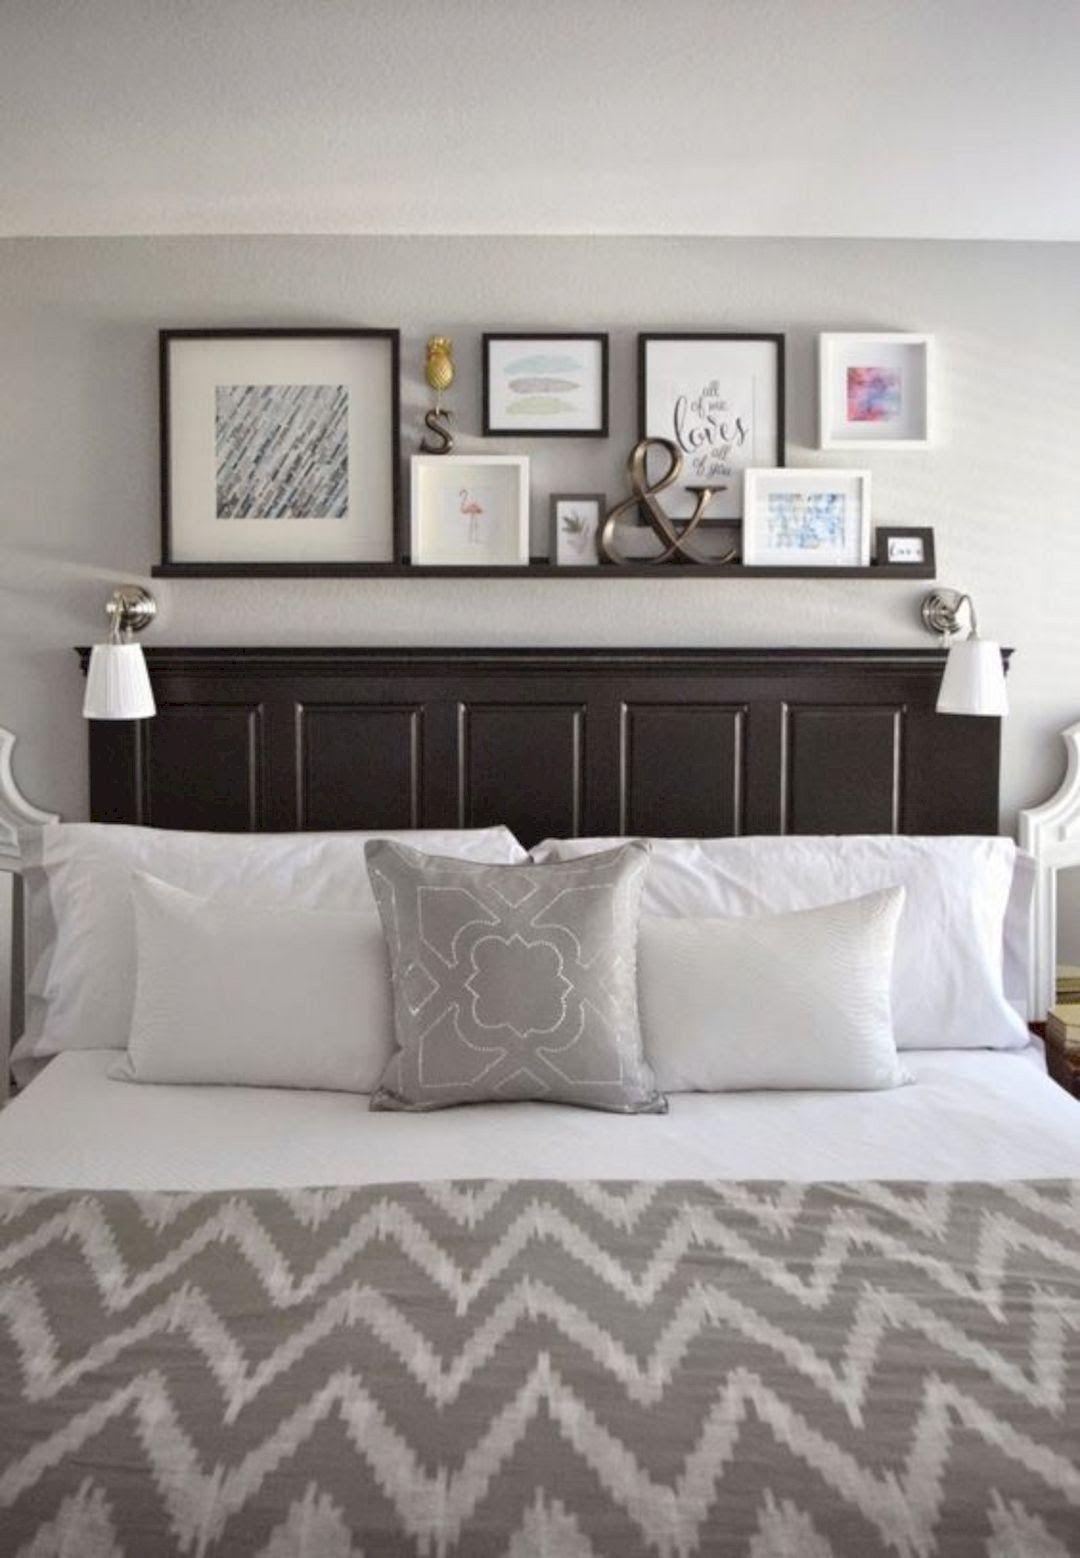 Bedroom decorating master bedroom ideas   Fantastic Master Bedroom Decorating Ideas in   Bedrooms